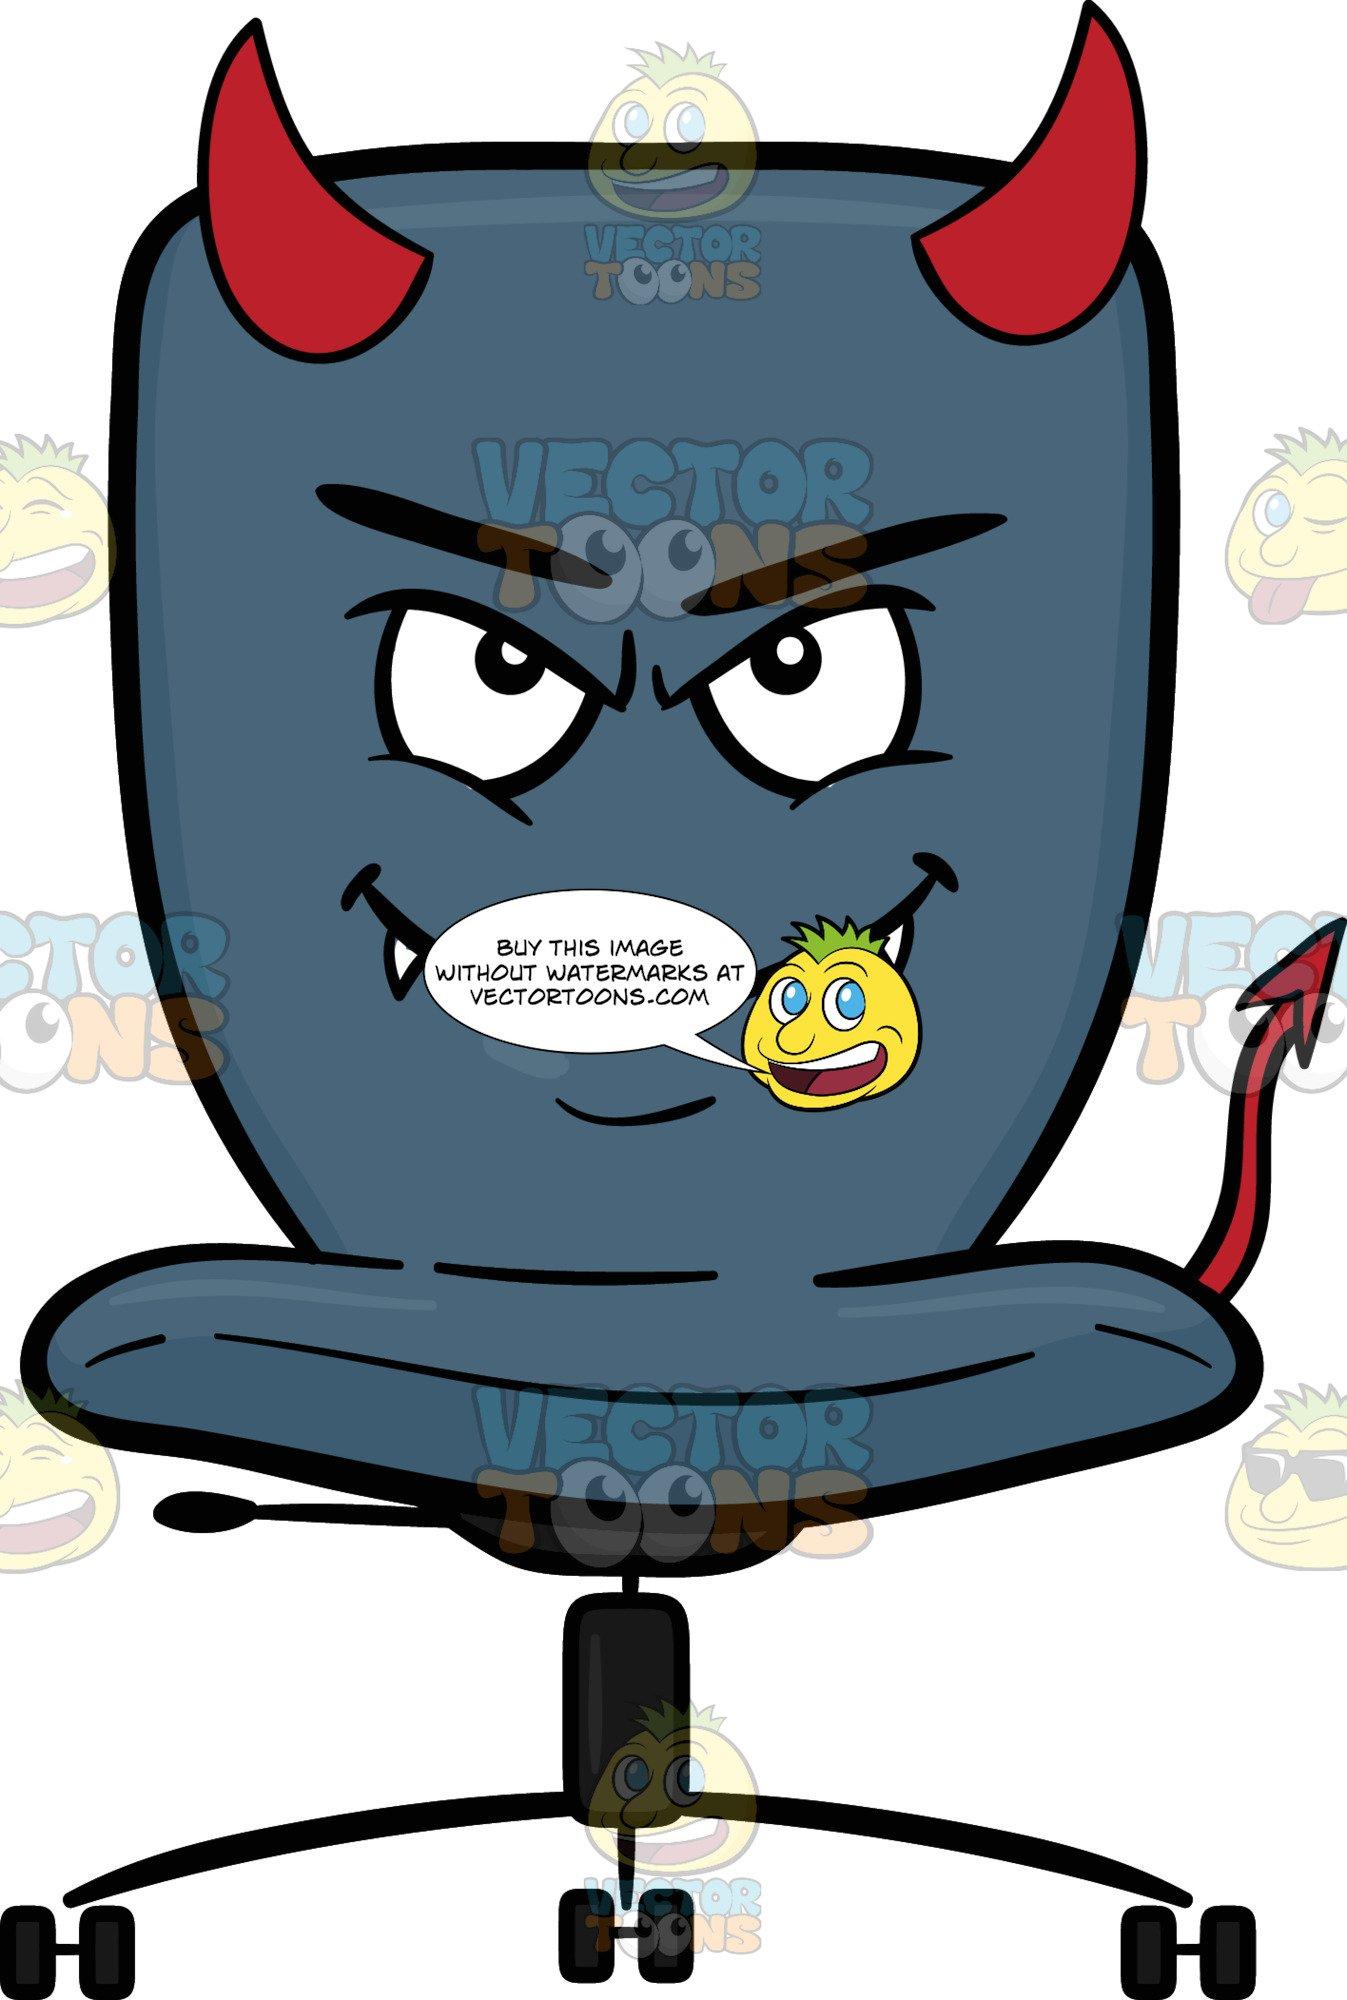 Diabolic clipart graphic transparent download Devilish Looking Swivel Desk Chair graphic transparent download